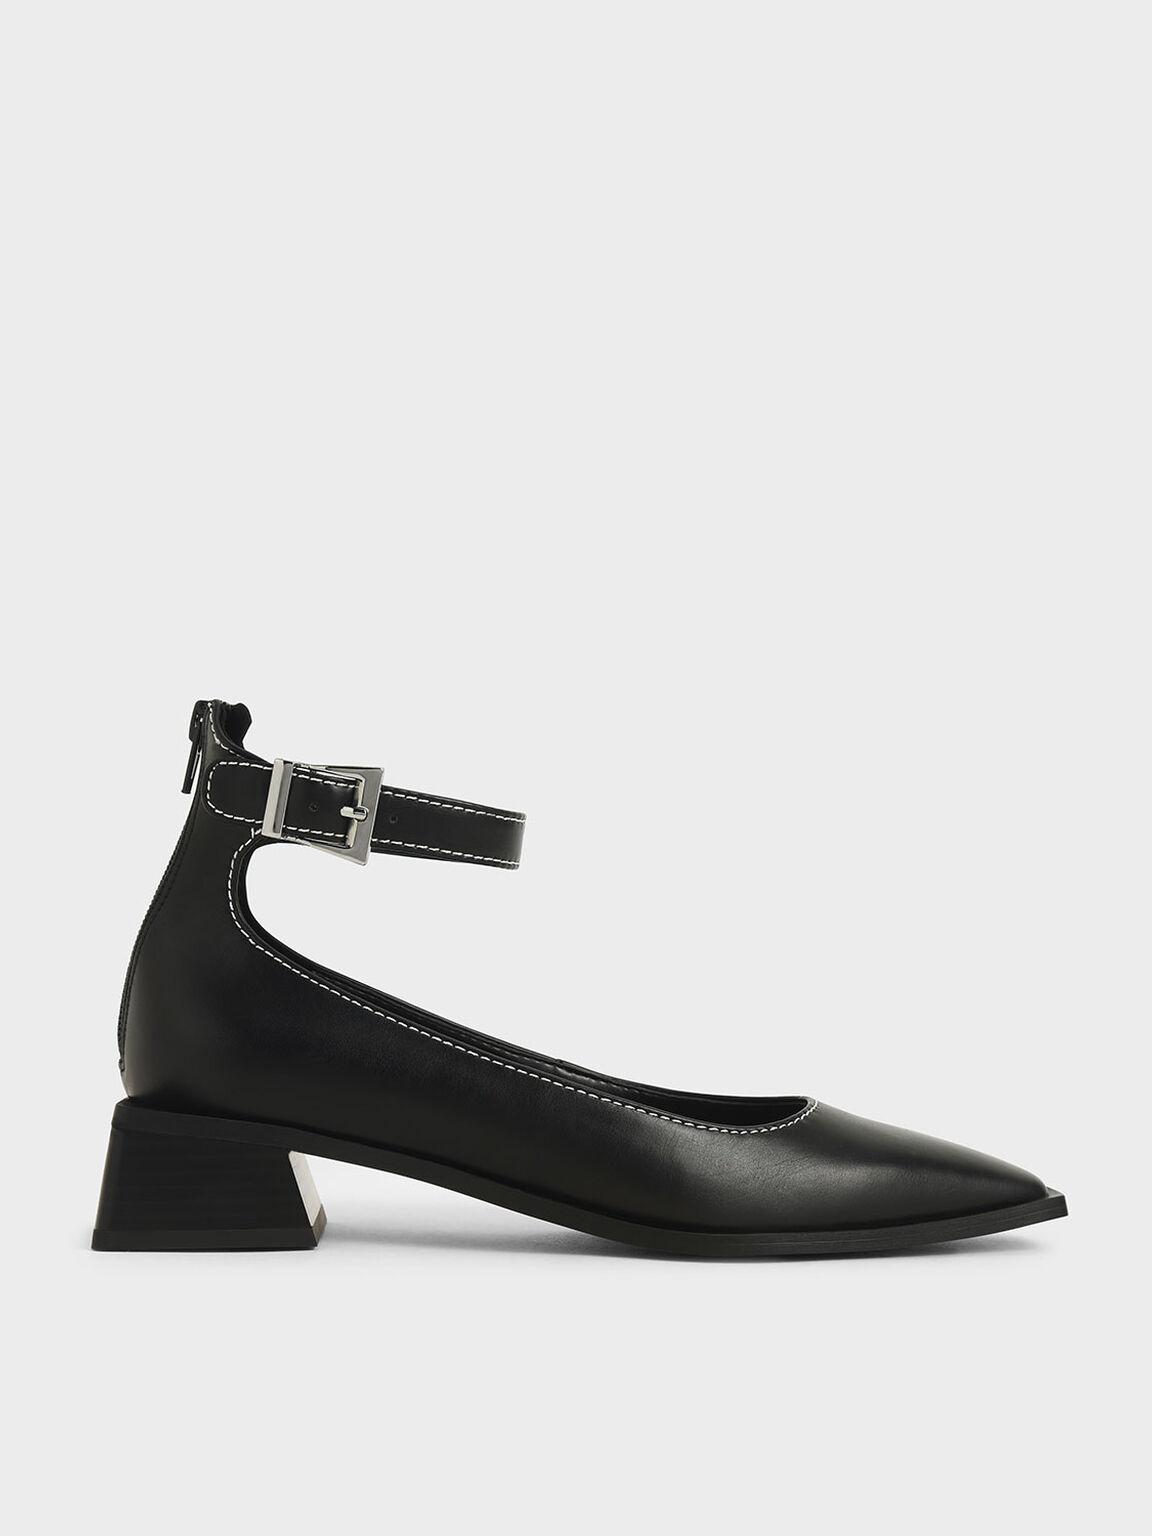 Ankle Strap Square Toe Pumps, Black, hi-res